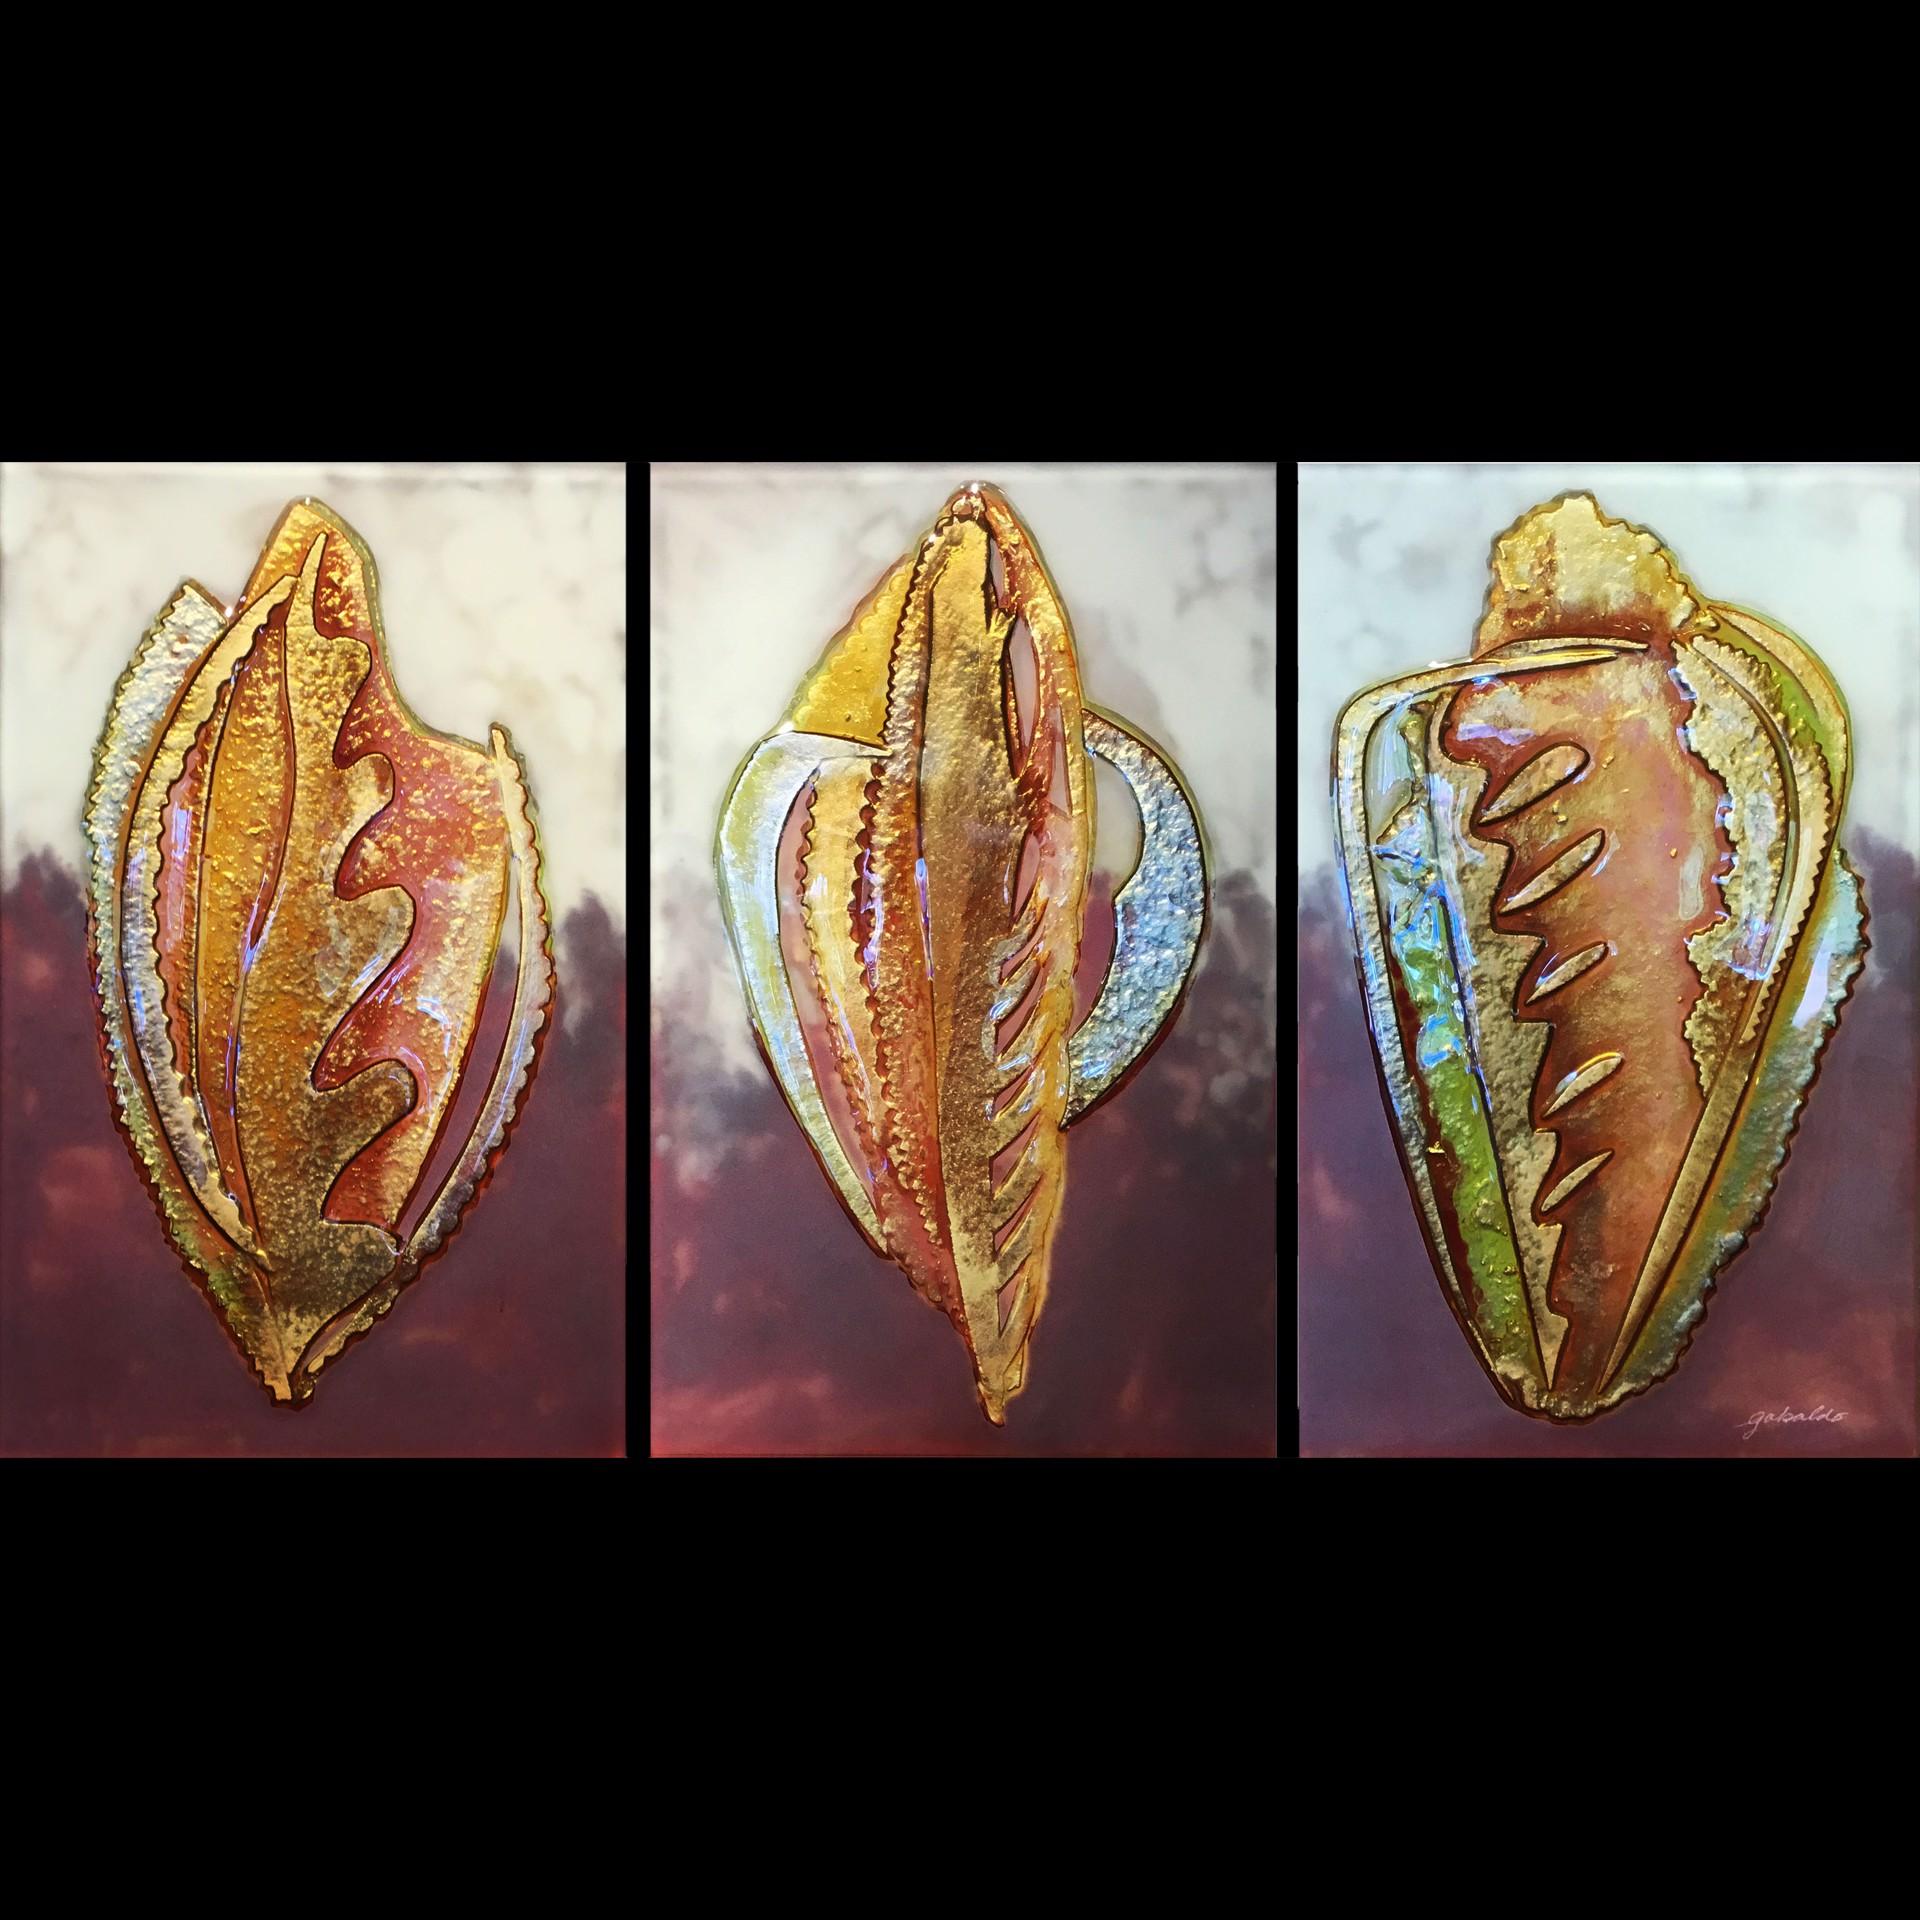 Drifting Time (Triptych) by Virginia Gabaldo